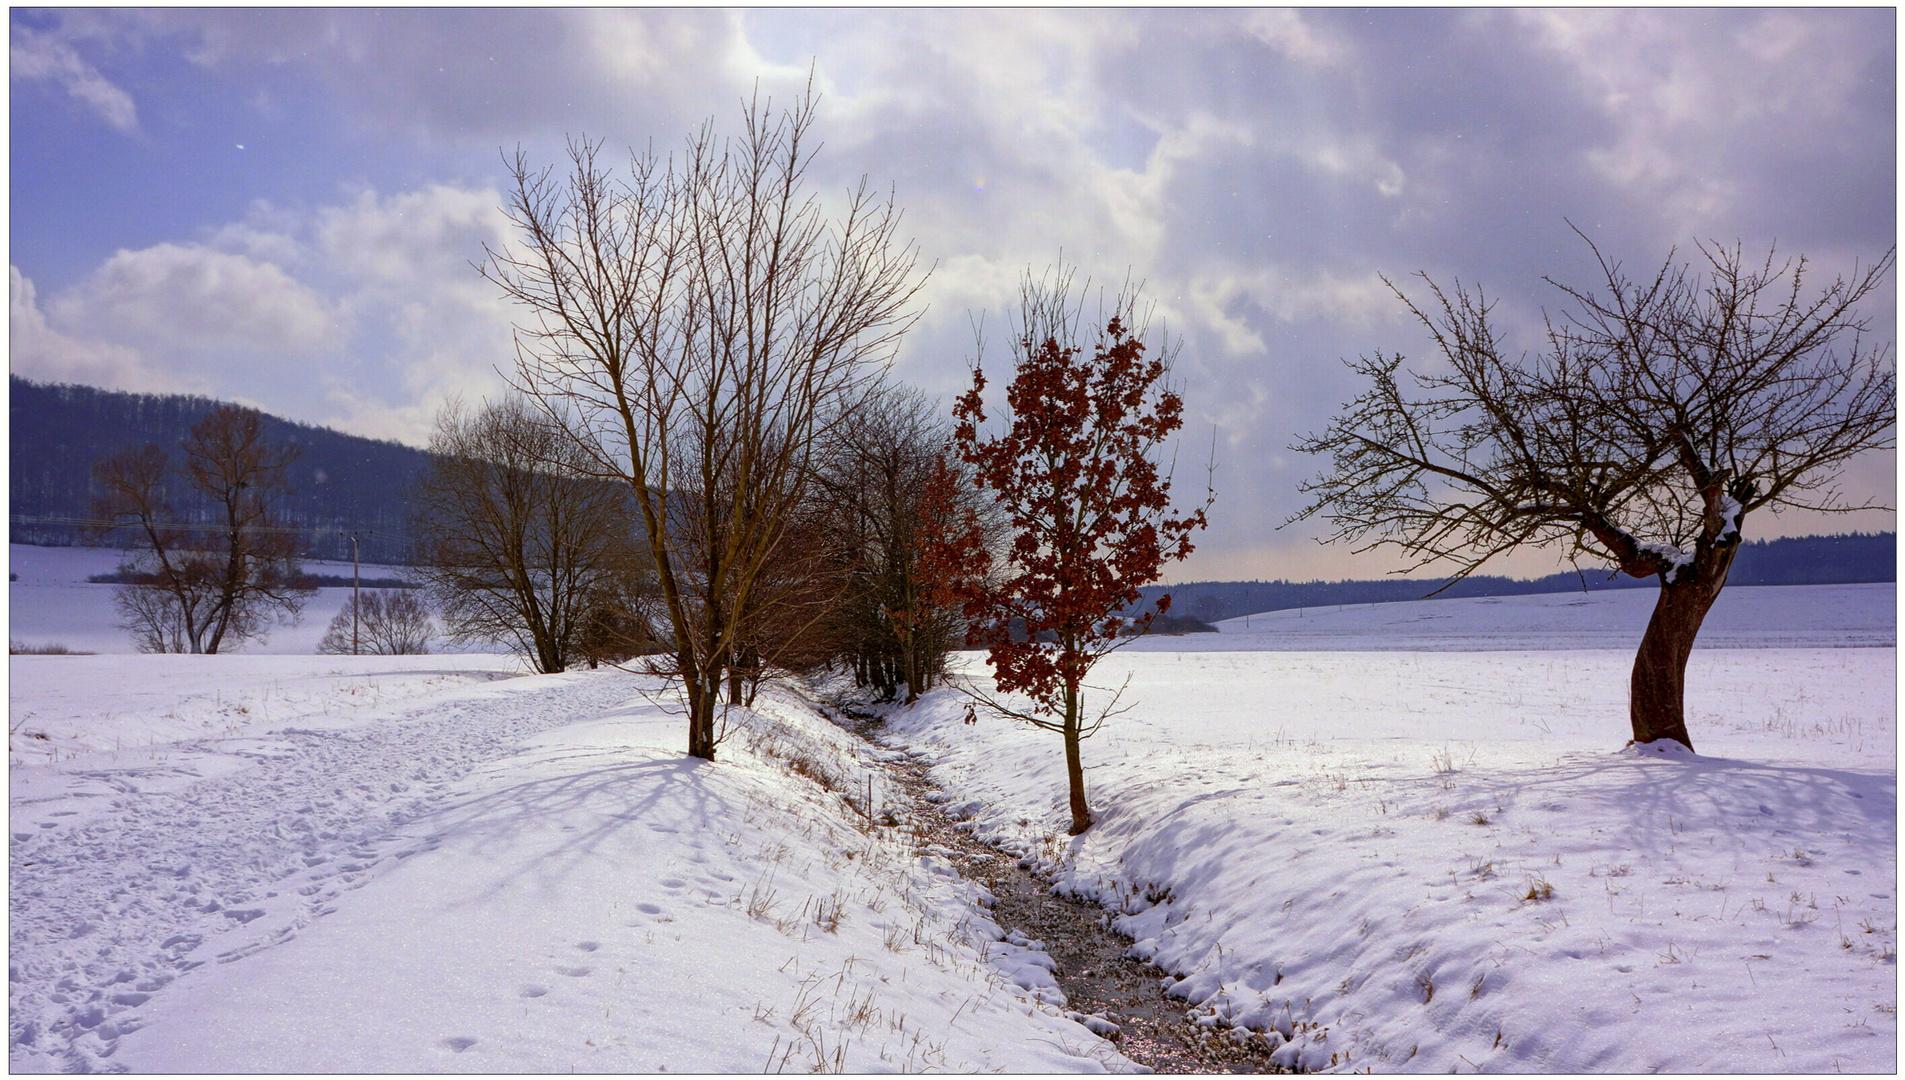 en el camino al lago (auf dem Weg zum See)